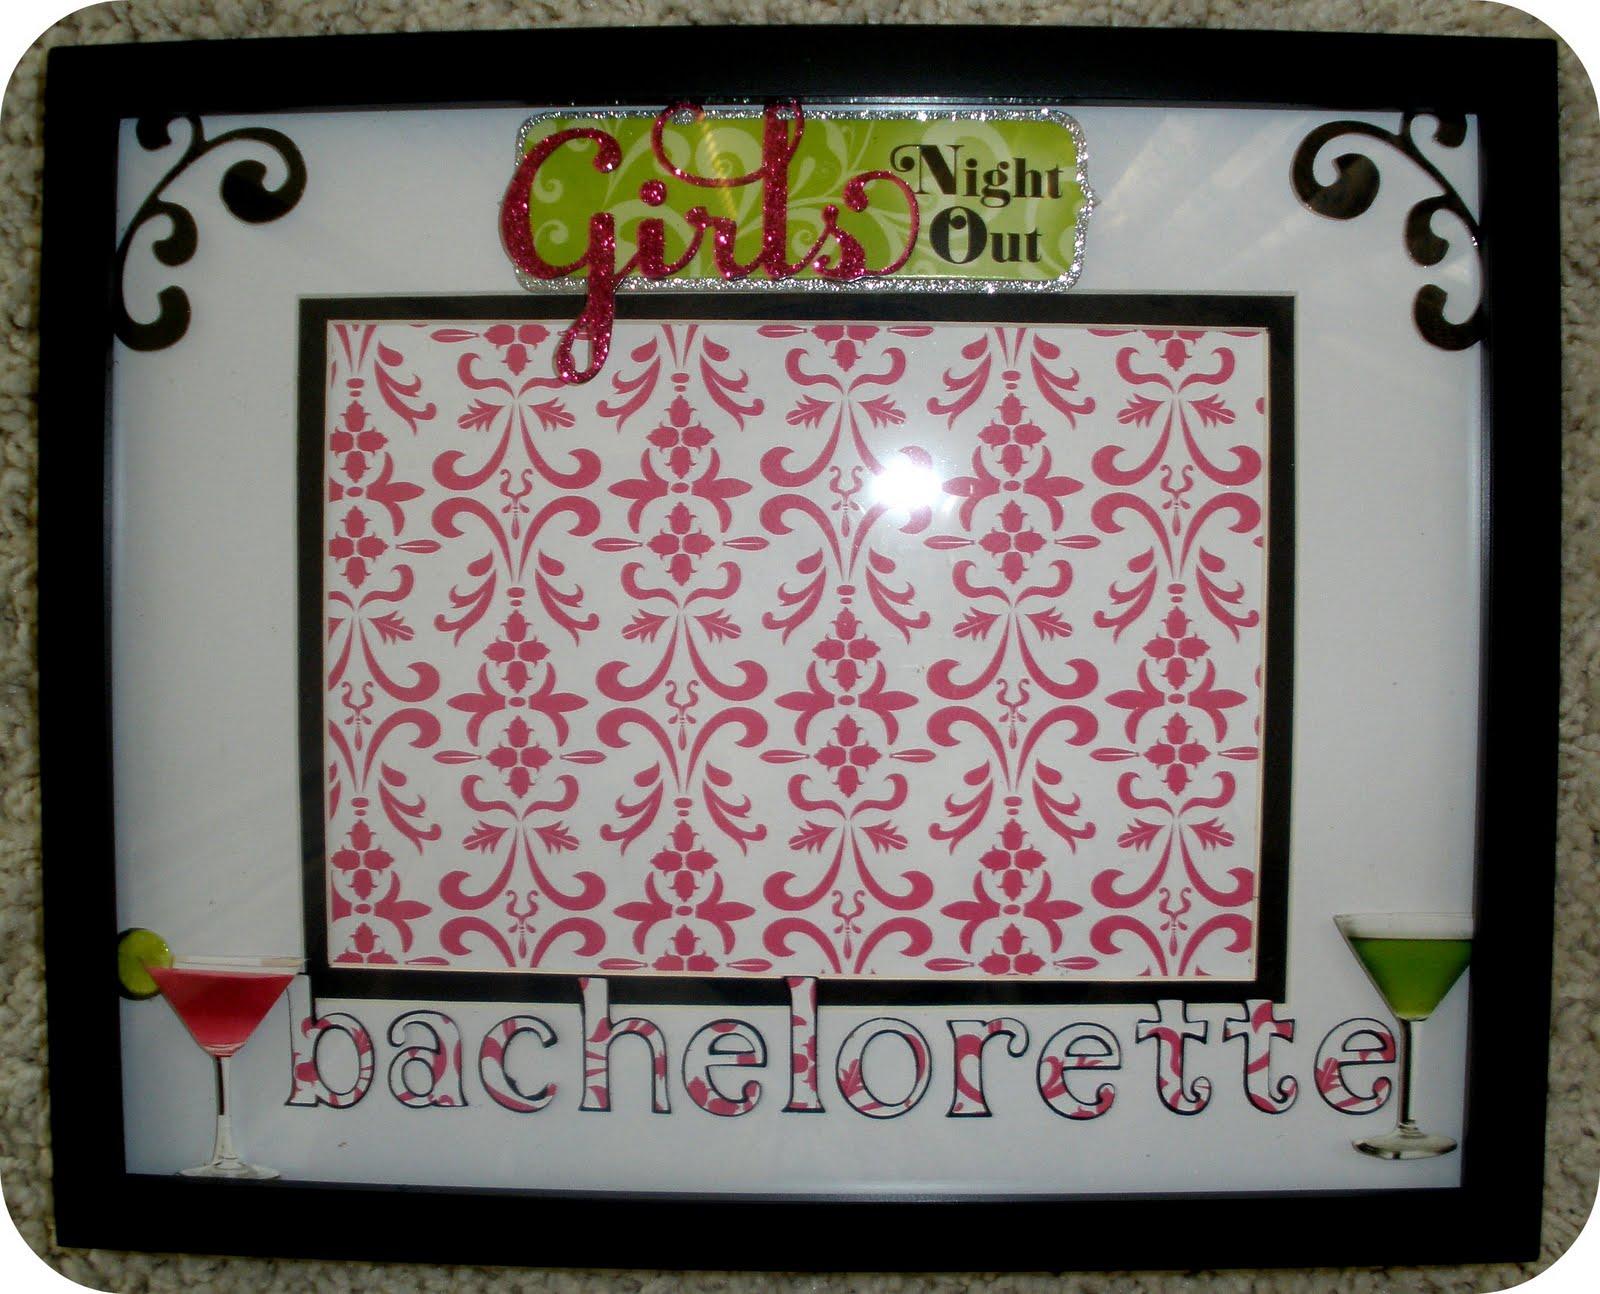 http://4.bp.blogspot.com/-zp5bRtJlsug/TbC7_7uGfCI/AAAAAAAAAFc/1wz6u3N0lGw/s1600/bachelorette+frame.jpg